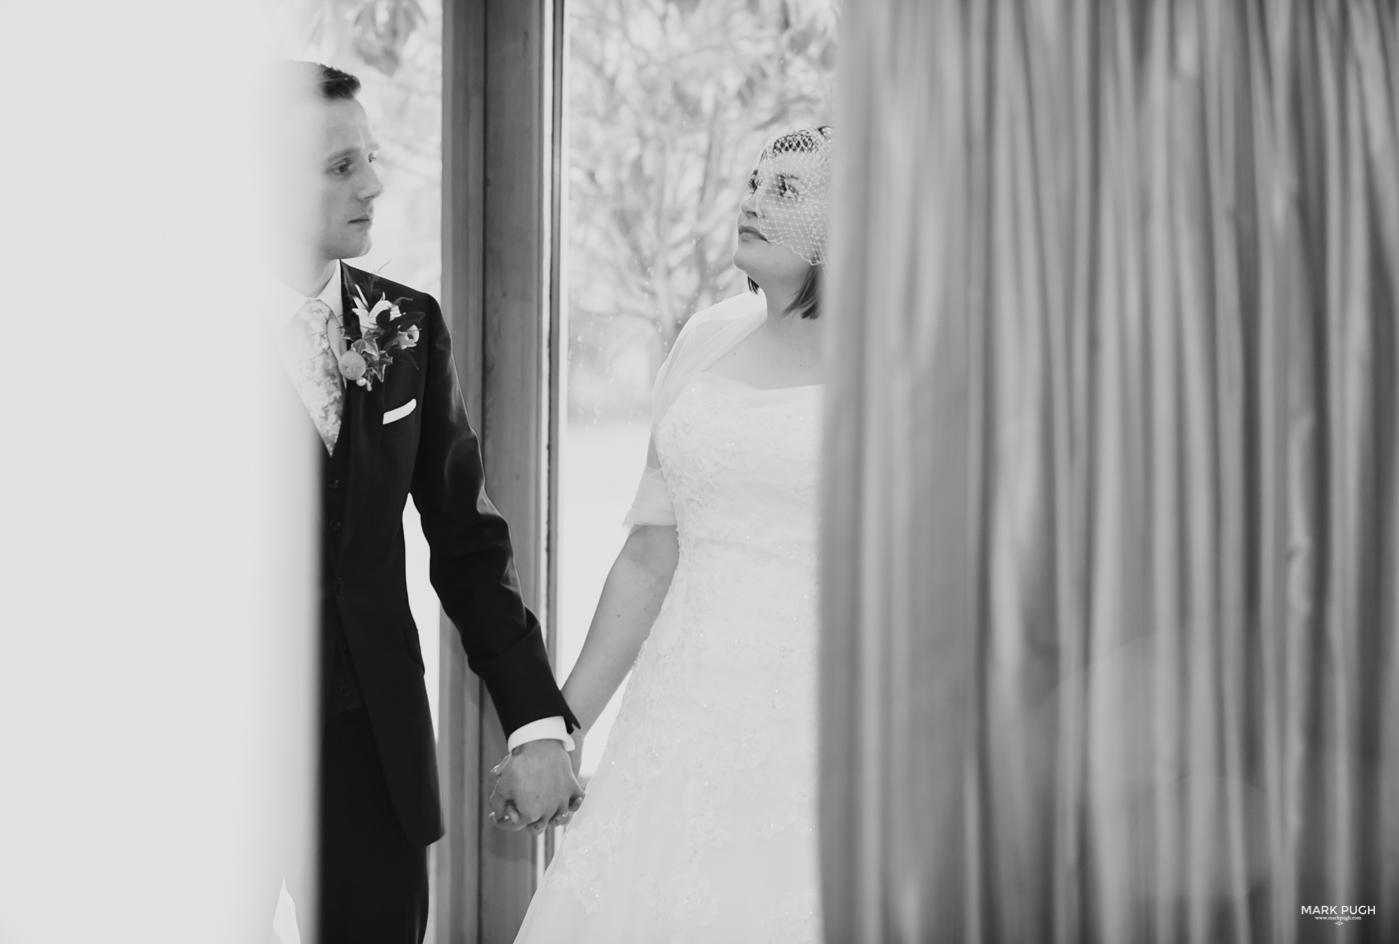 040 Wedding Photography Award winning Wedding Photographer and Videographer Mark Pugh www.markpugh.com.JPG